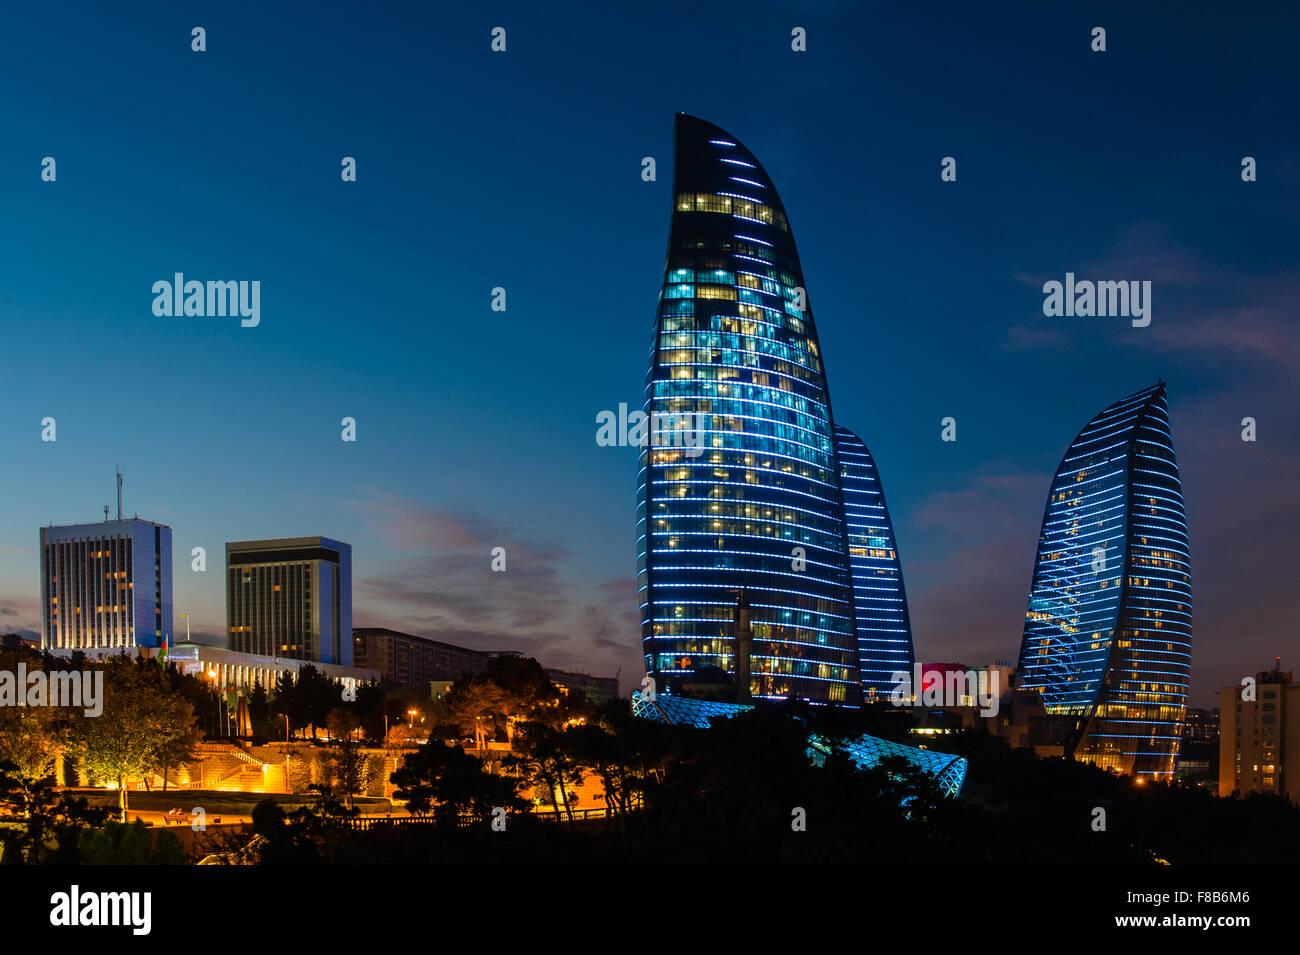 Flame Towers are new skyscrapers in Baku, Azerbaijan - Stock Image